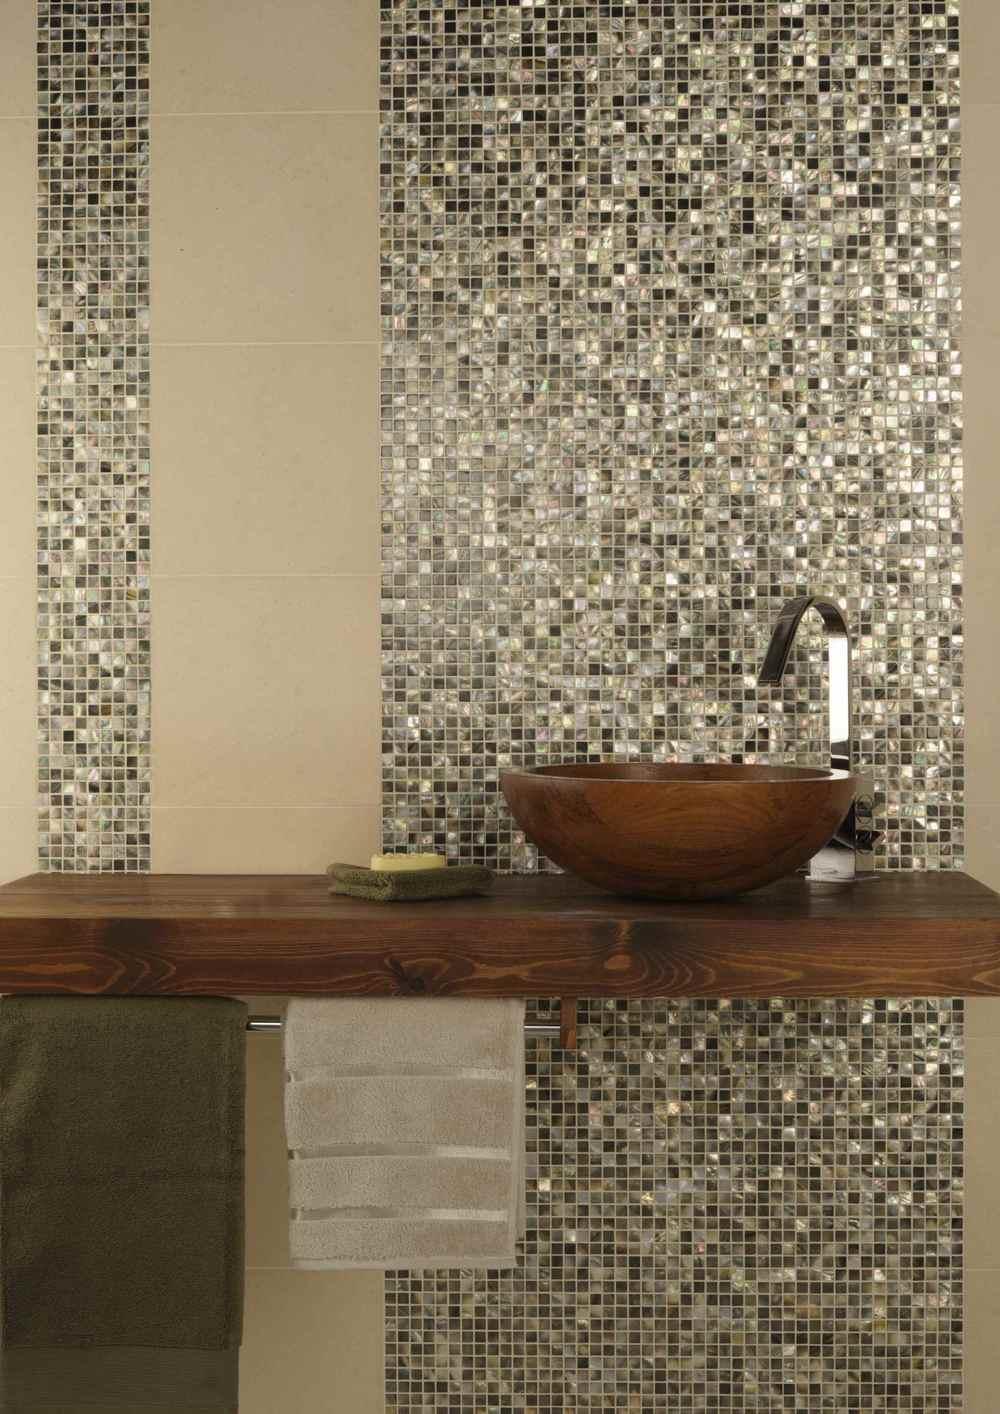 Original Style_Mosaics_Mother of Pearl 300x300x2mm Natural Shell  €89.95 €999.49 per sq m.jpg